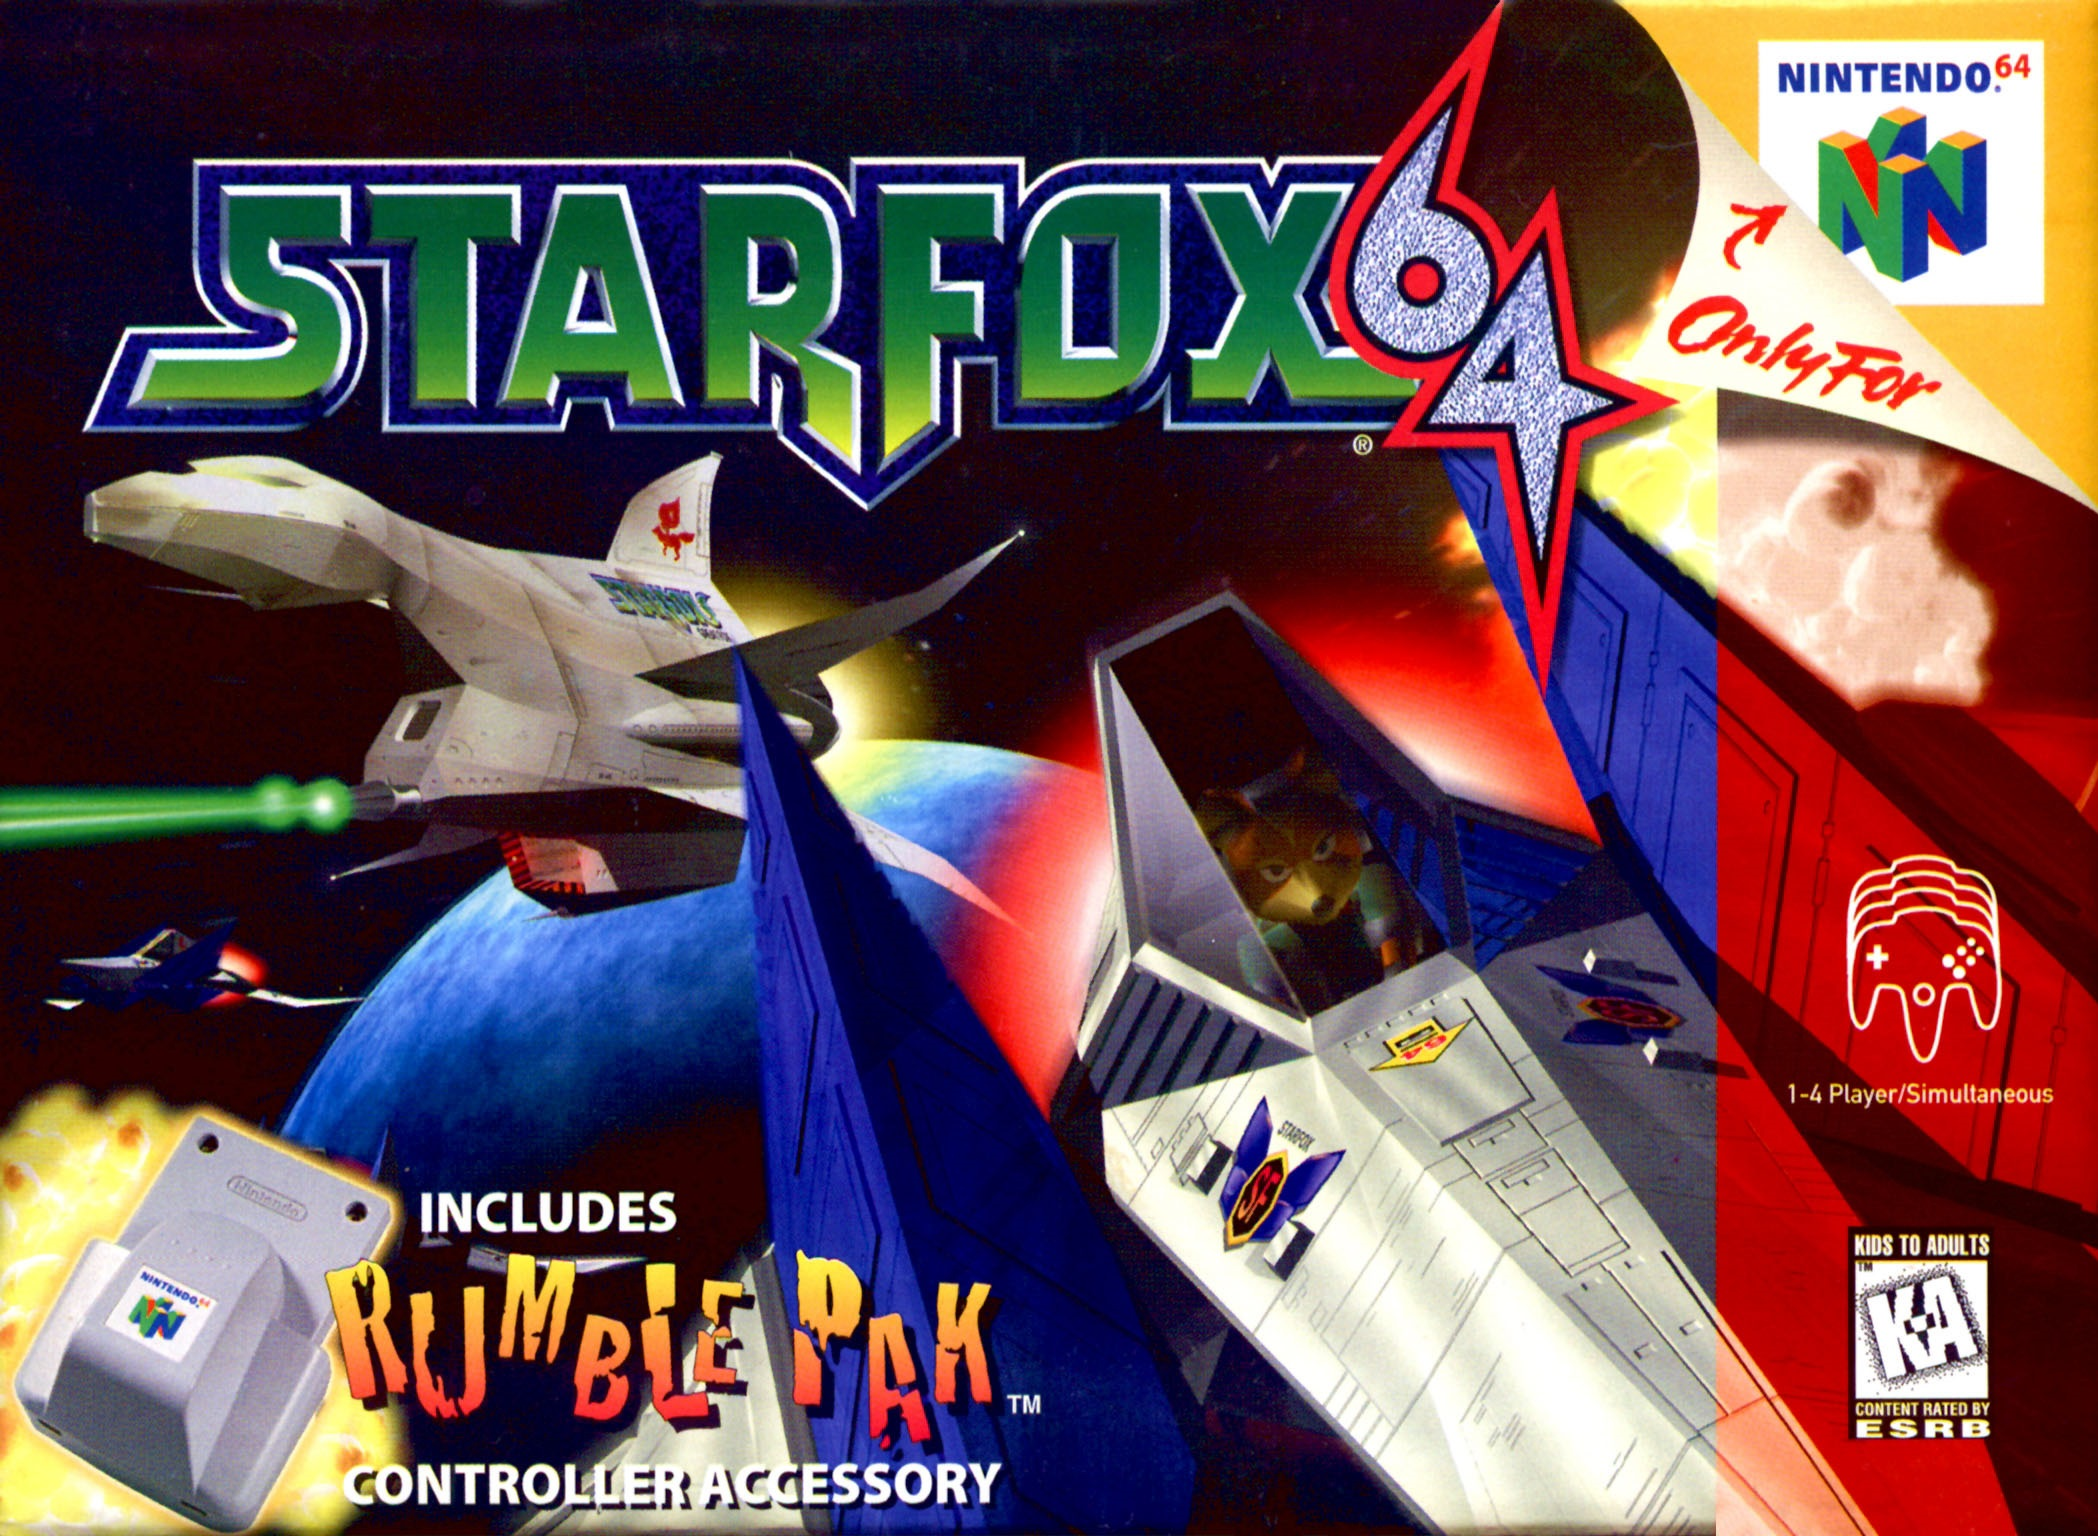 star fox n64 cover game